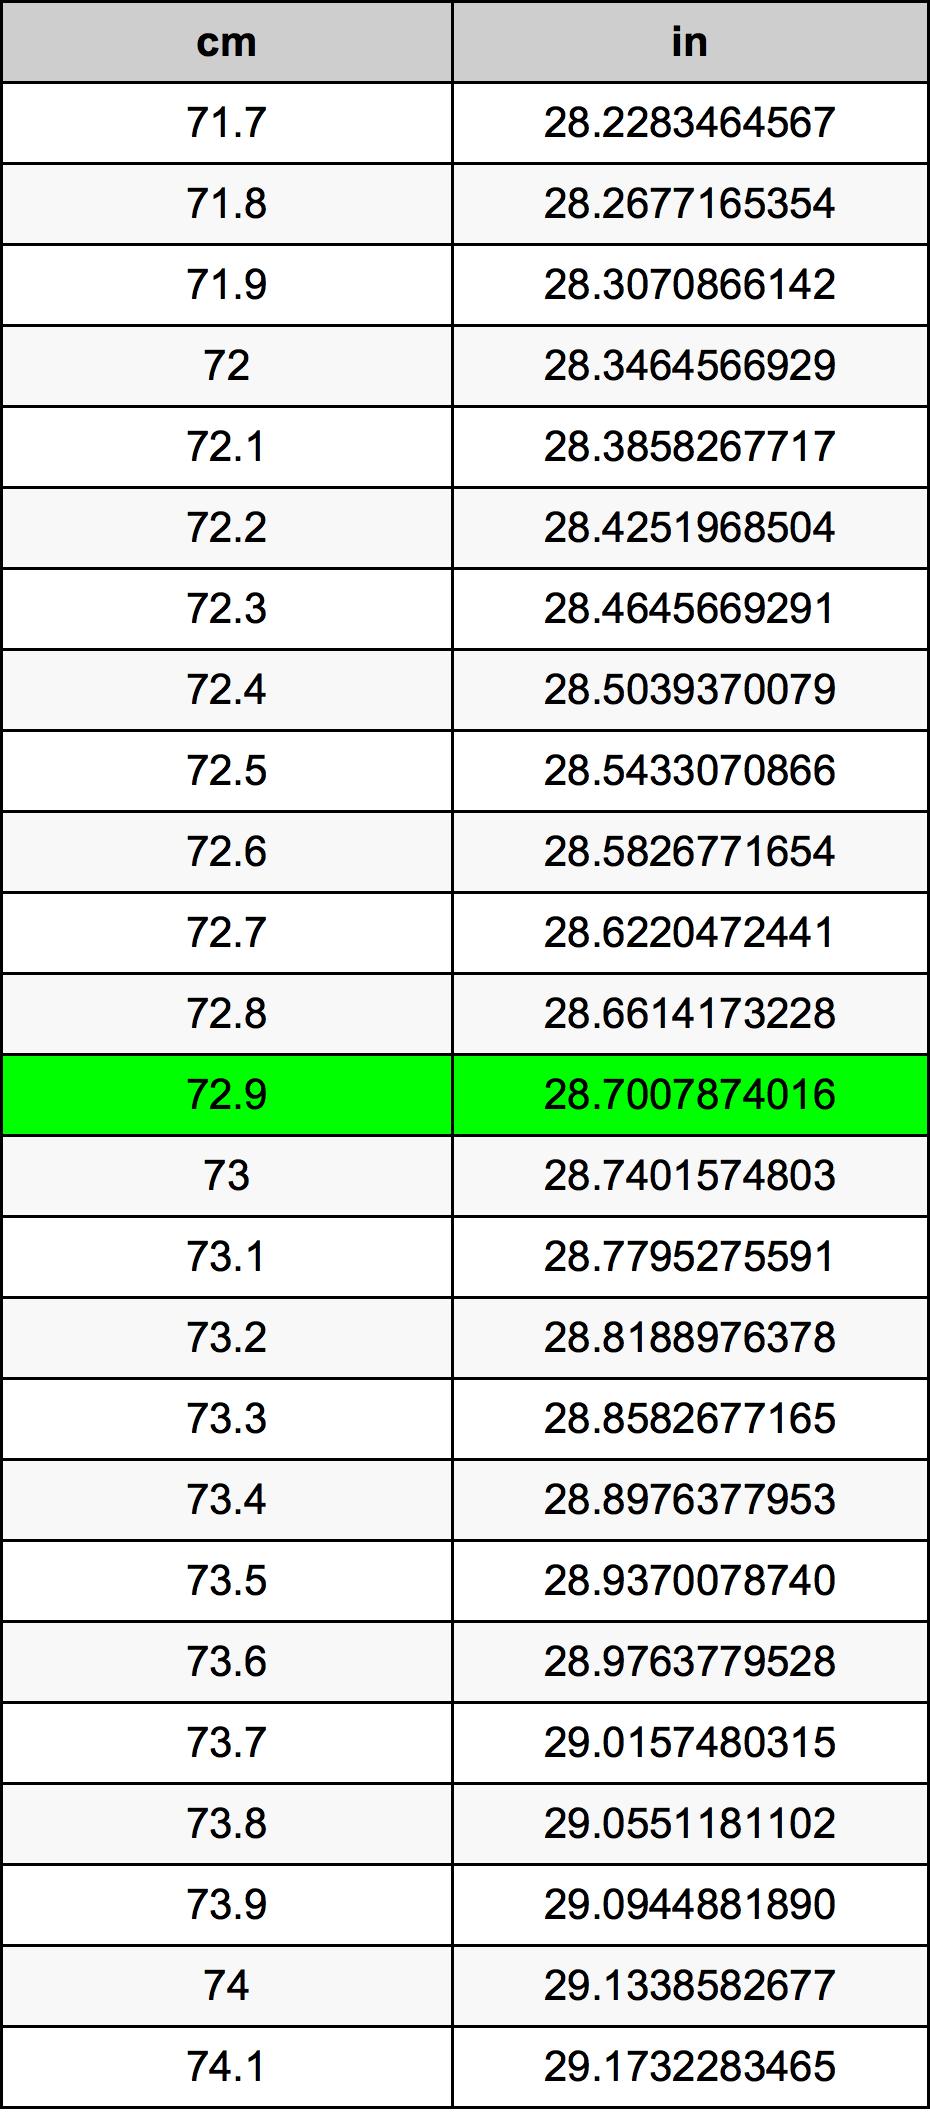 72.9 Centimeter konverteringstabellen